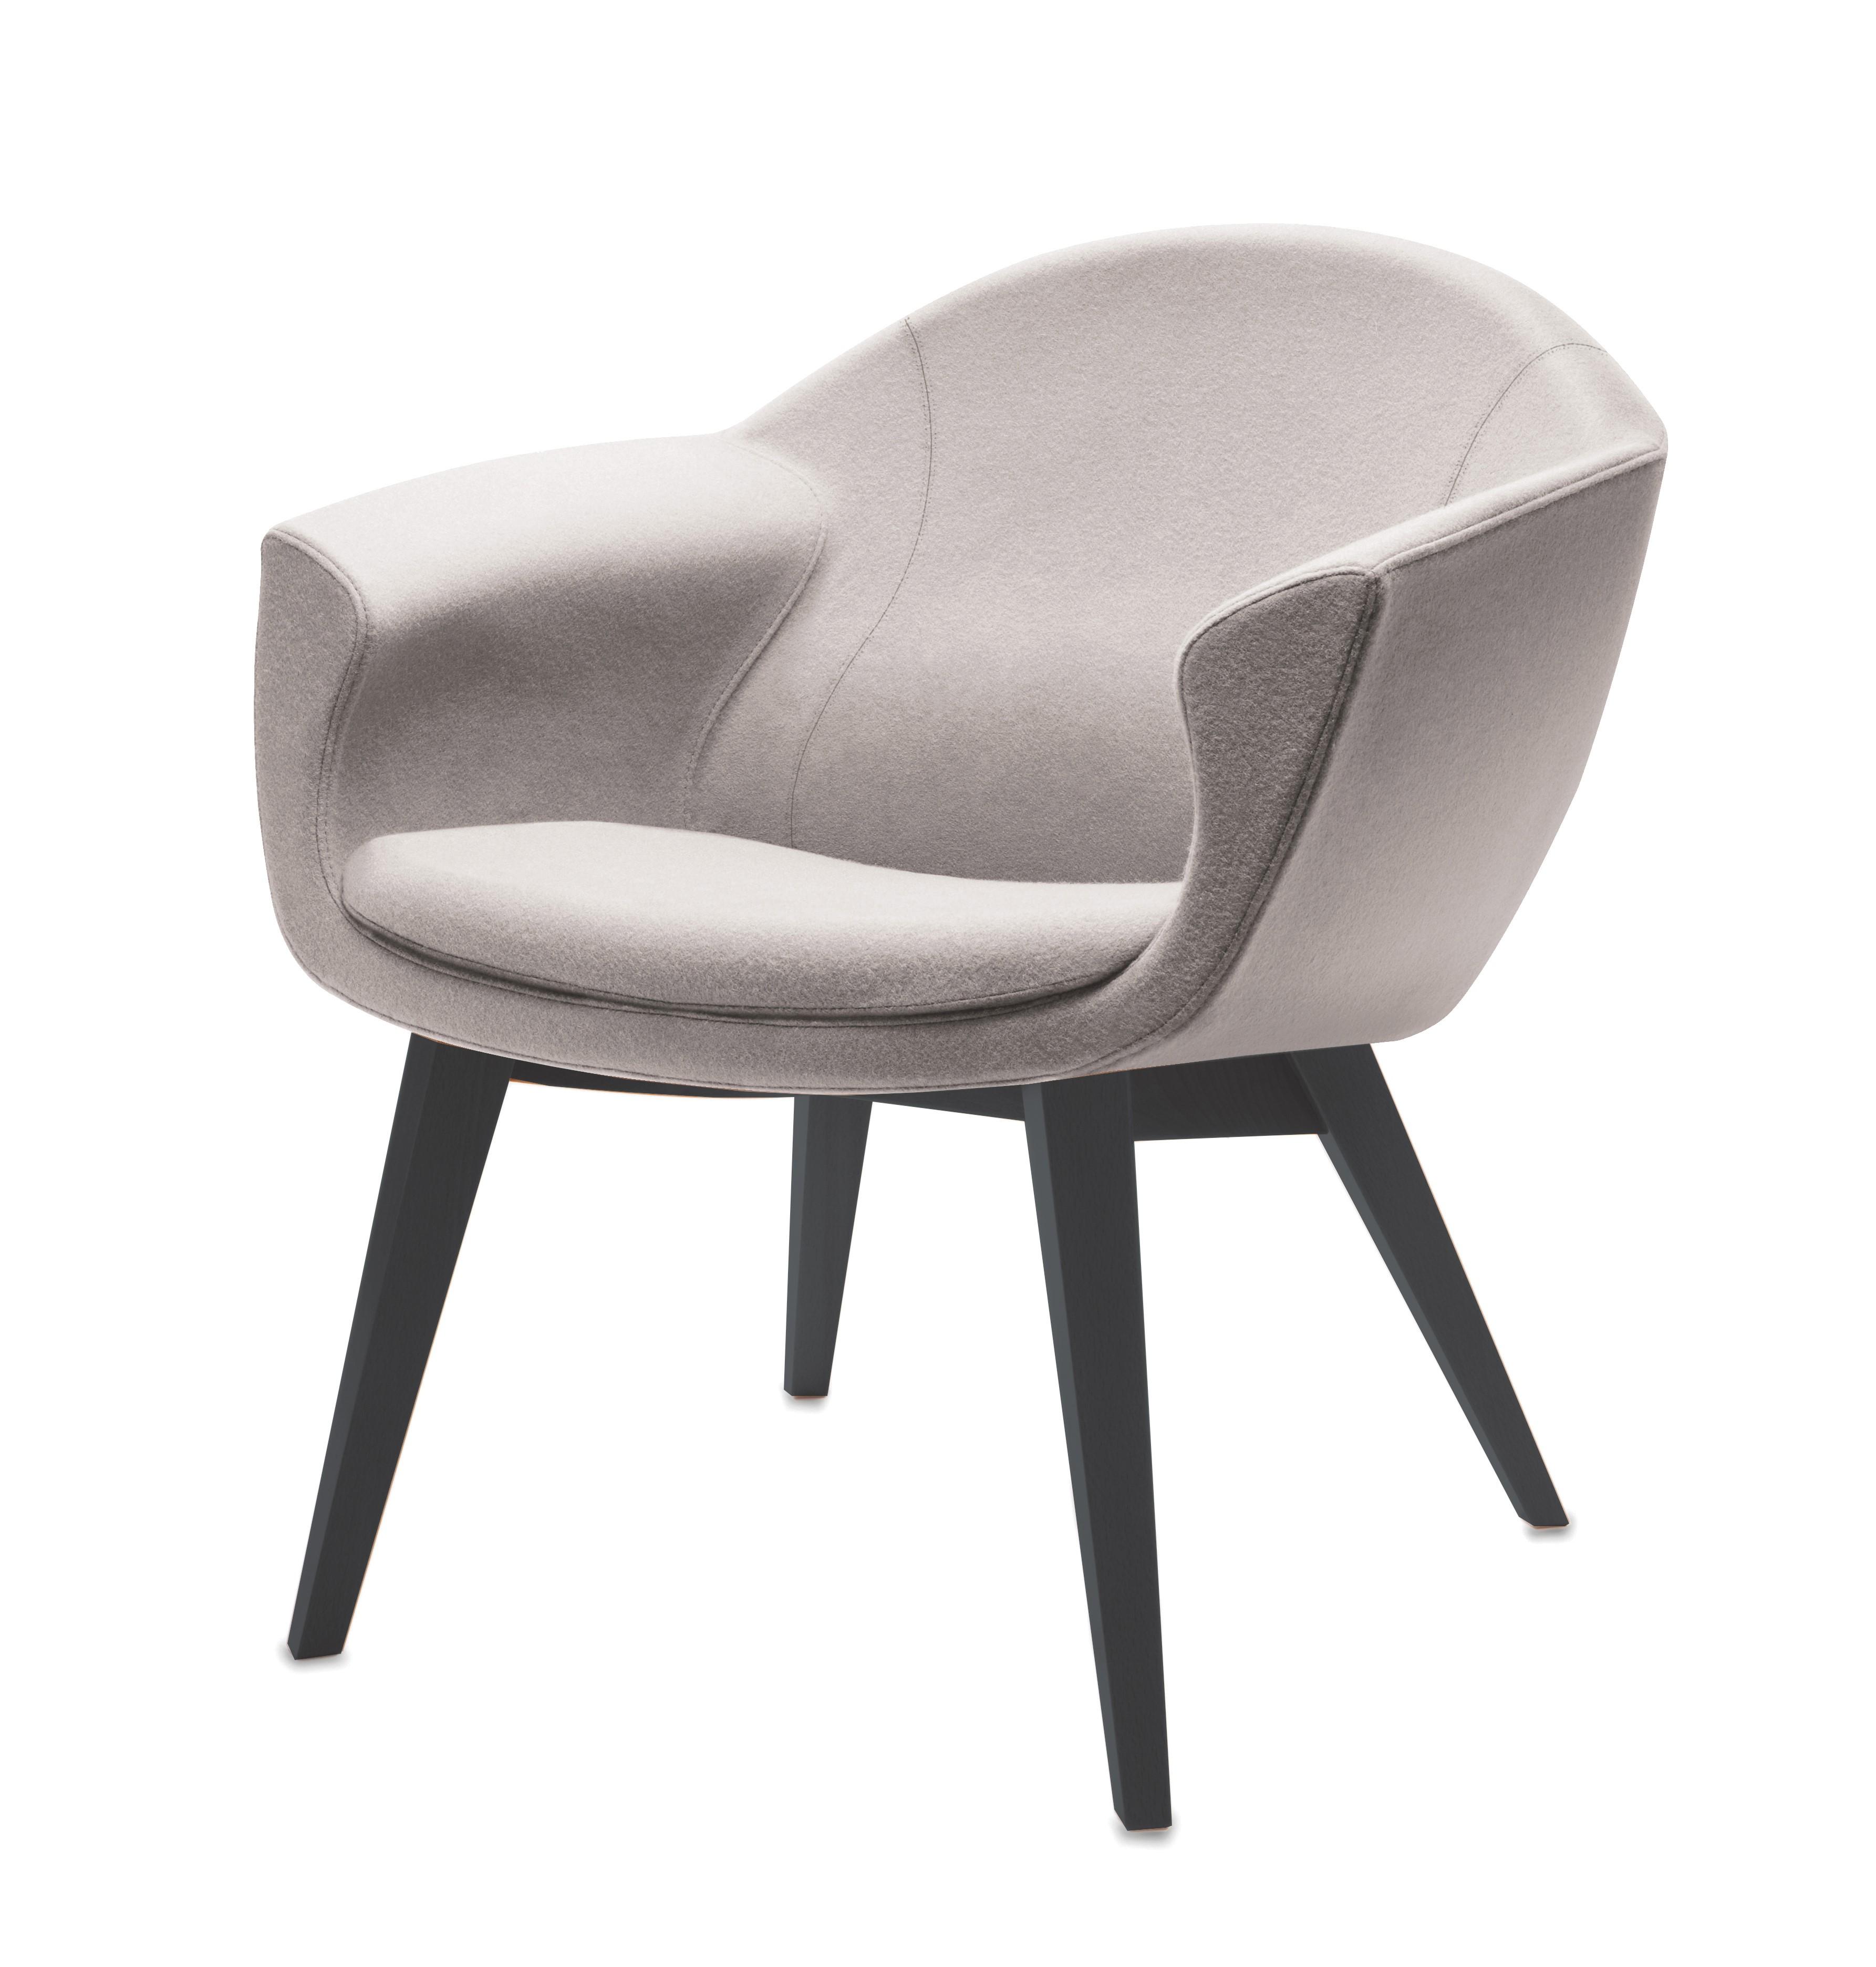 Mortimer Soft Seating - SMO1I